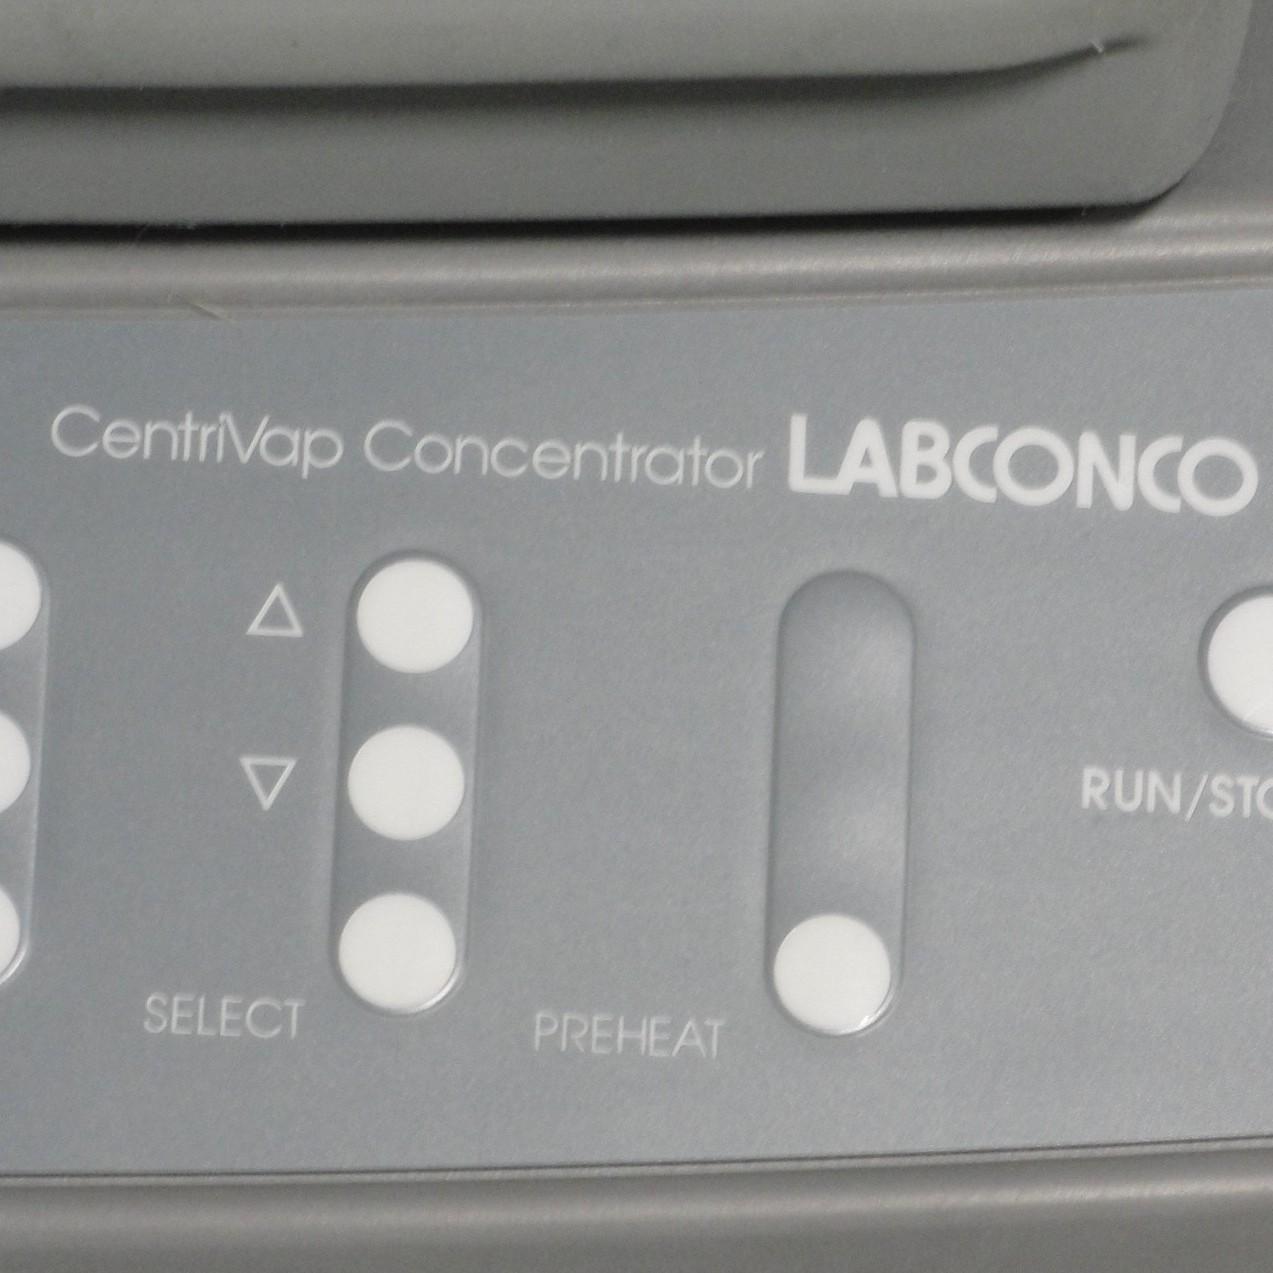 Labconco CentriVap System Image